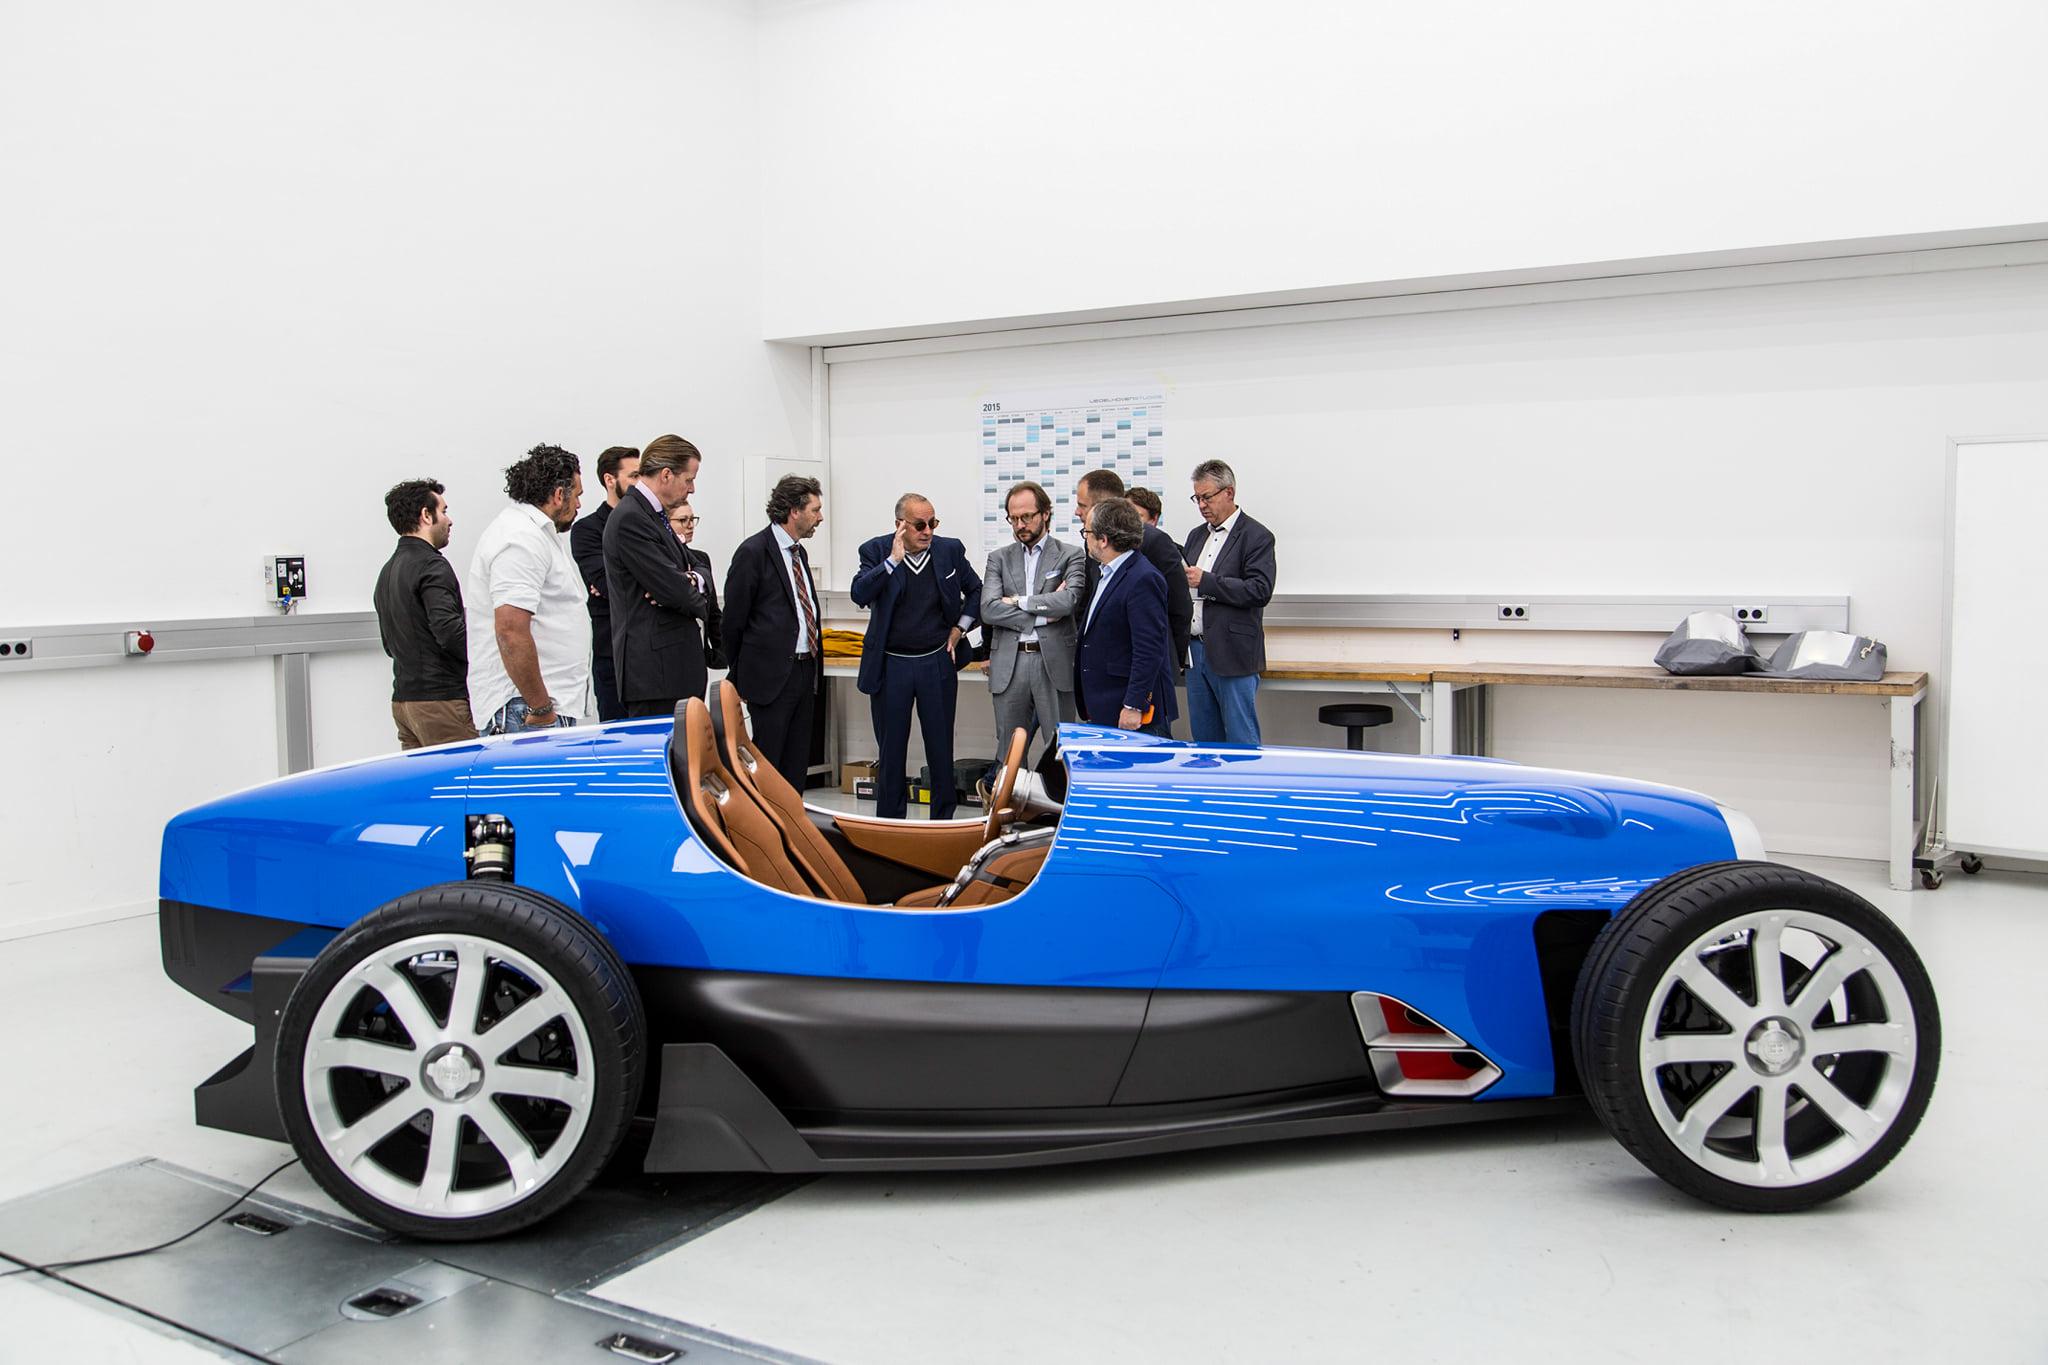 Bugatti-Type-35-D-by-Uedelhoven-Studios-4